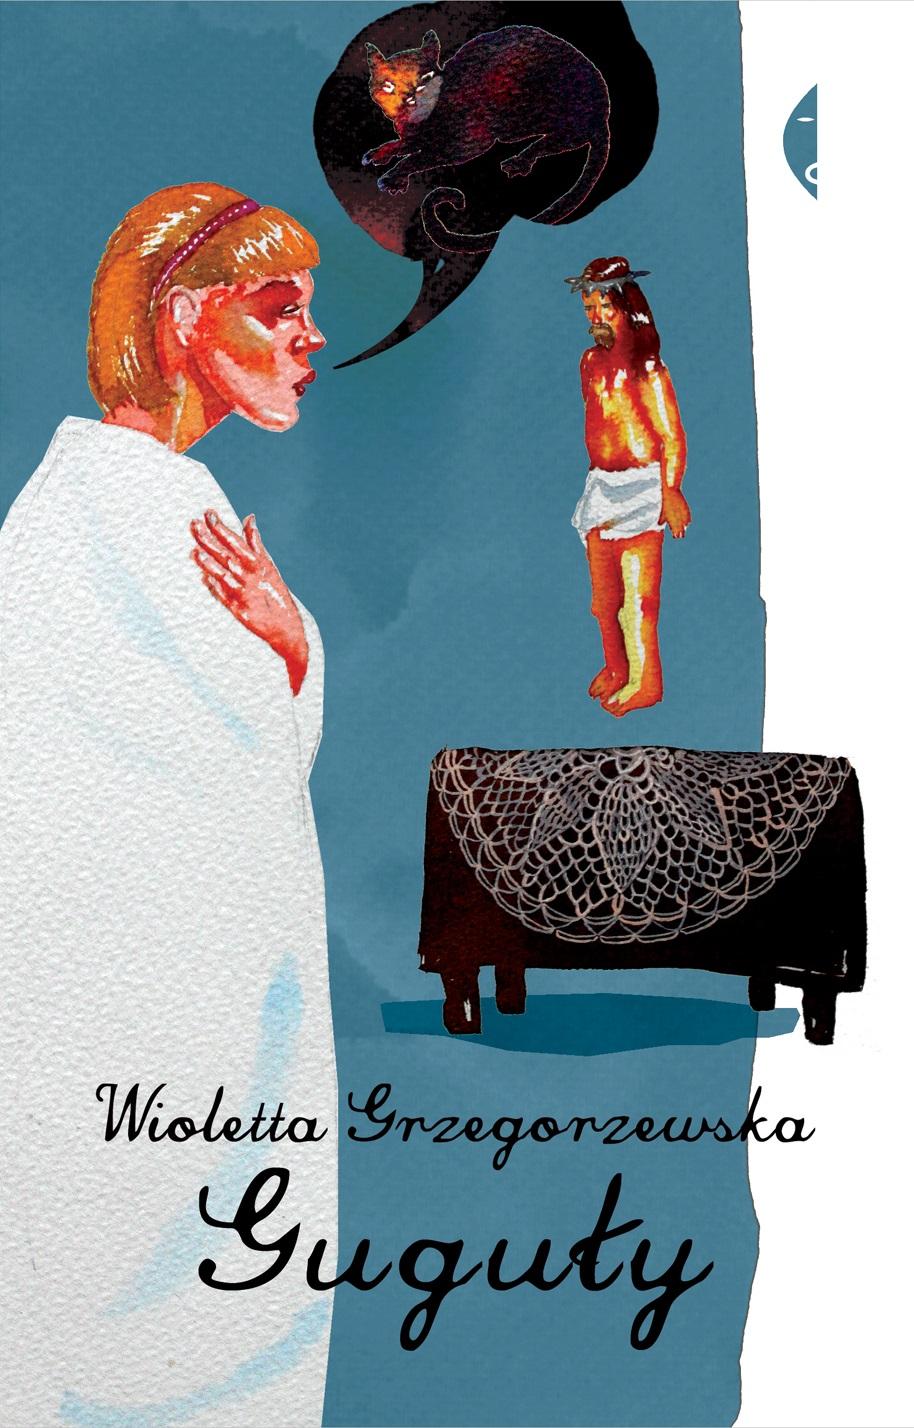 https://czarne.com.pl/uploads/catalog/product/cover/655/guguly_1.jpg